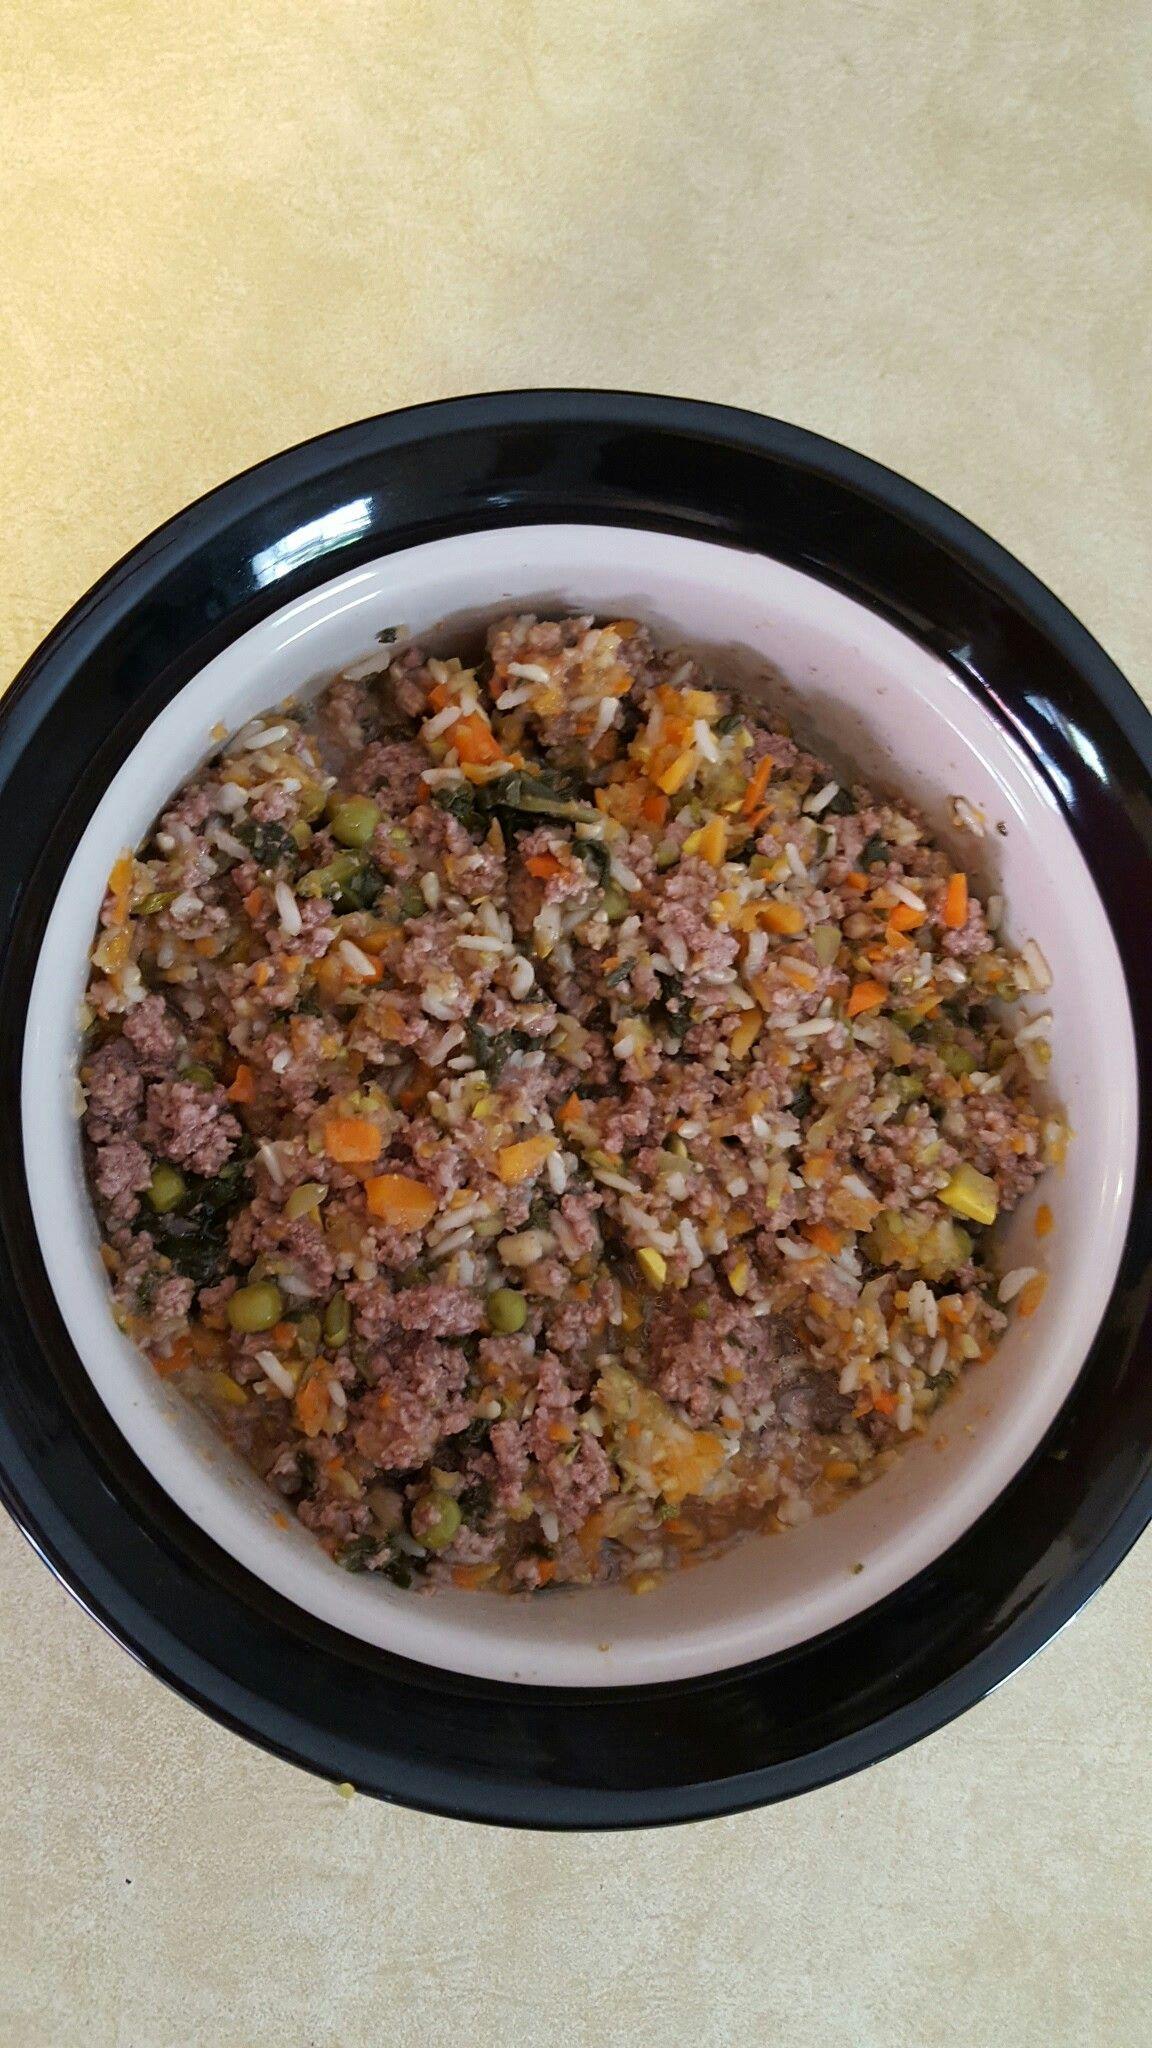 New Milford Ct Dog Food Recipes Make Dog Food Food